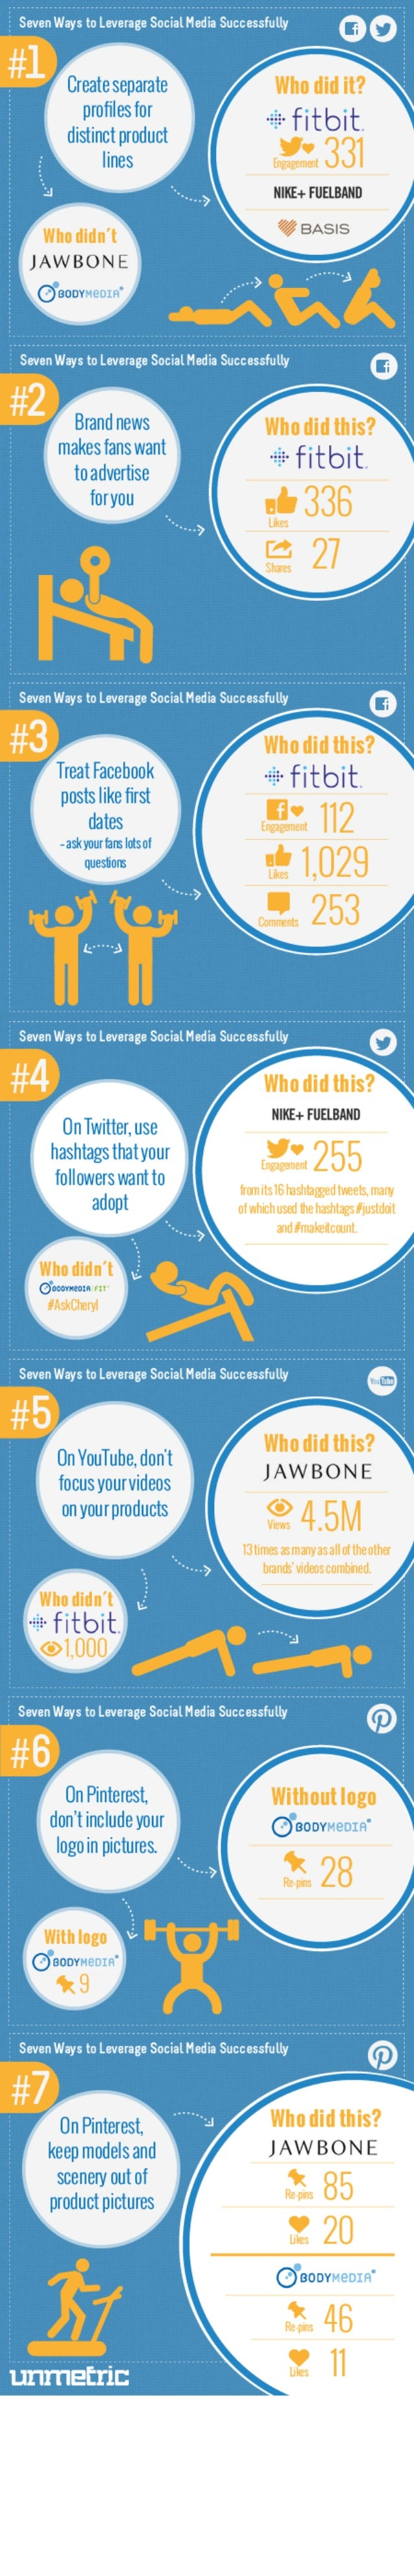 Seven ways Fitness Brands Leverage Social Media